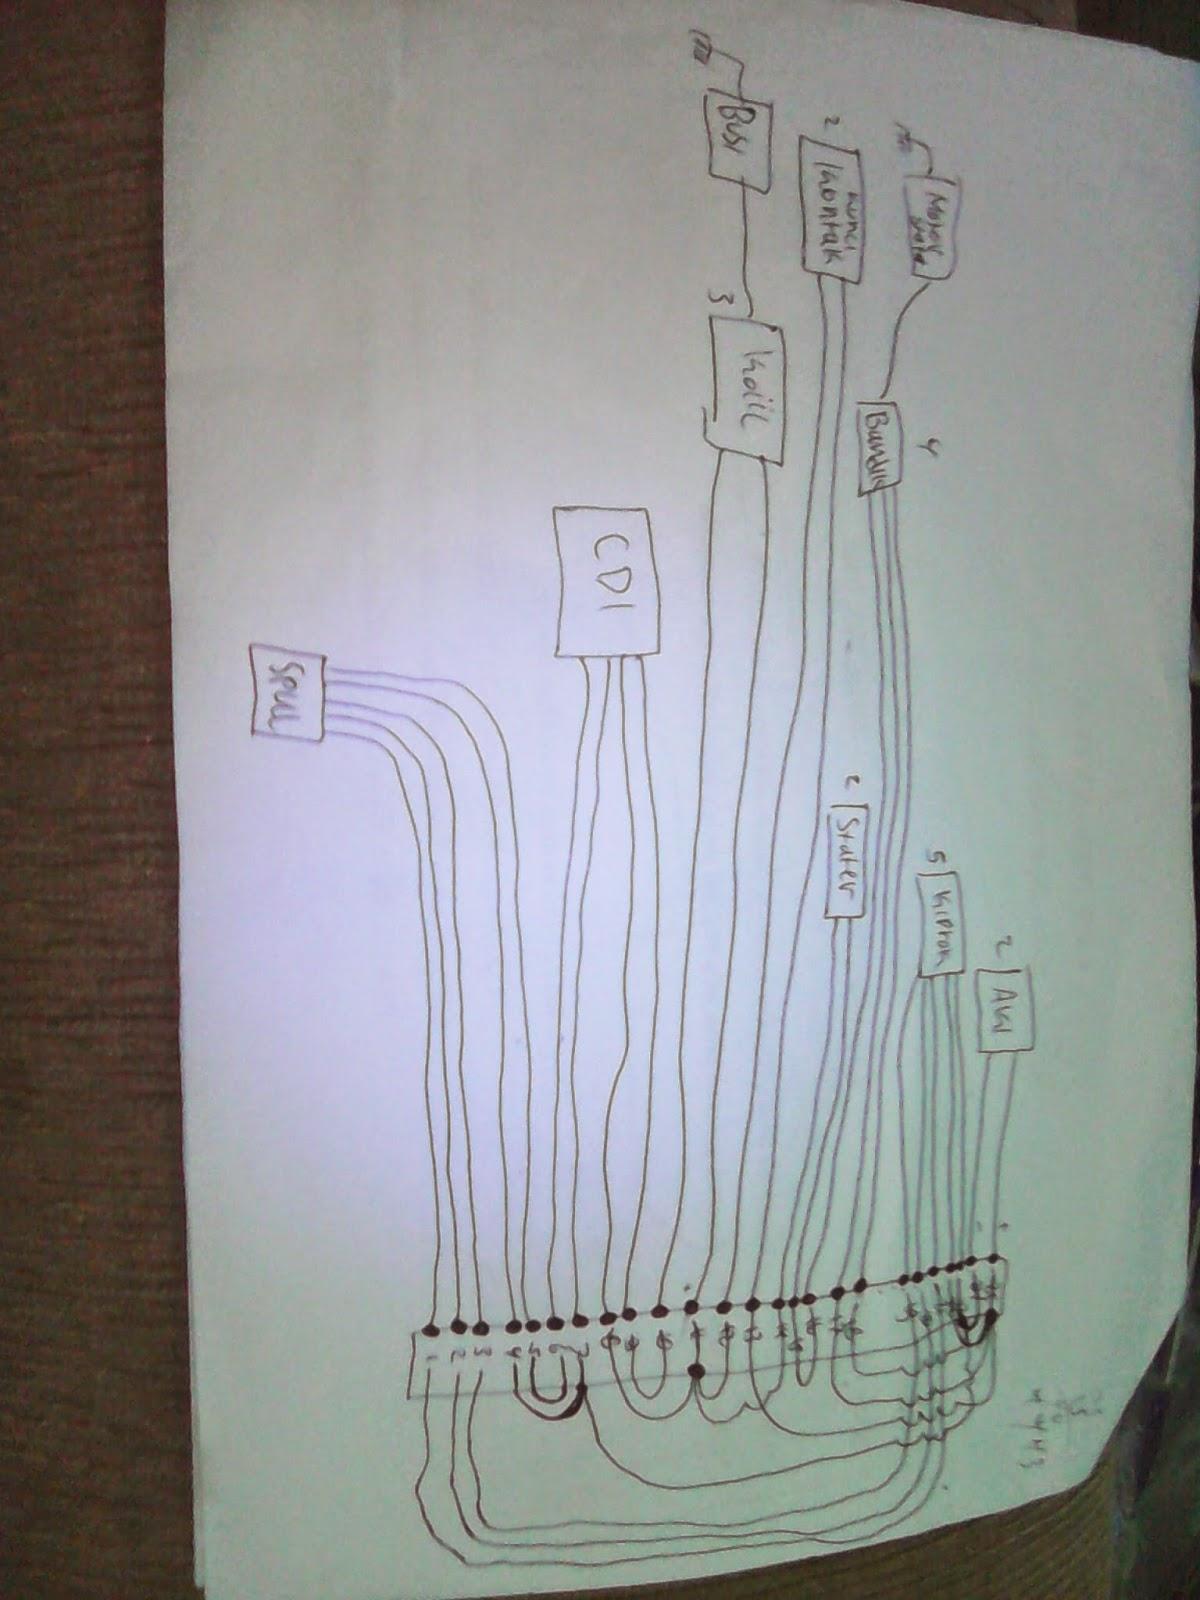 Thunder 125 diagram kelistrikan thunder 125 cheapraybanclubmaster Image collections